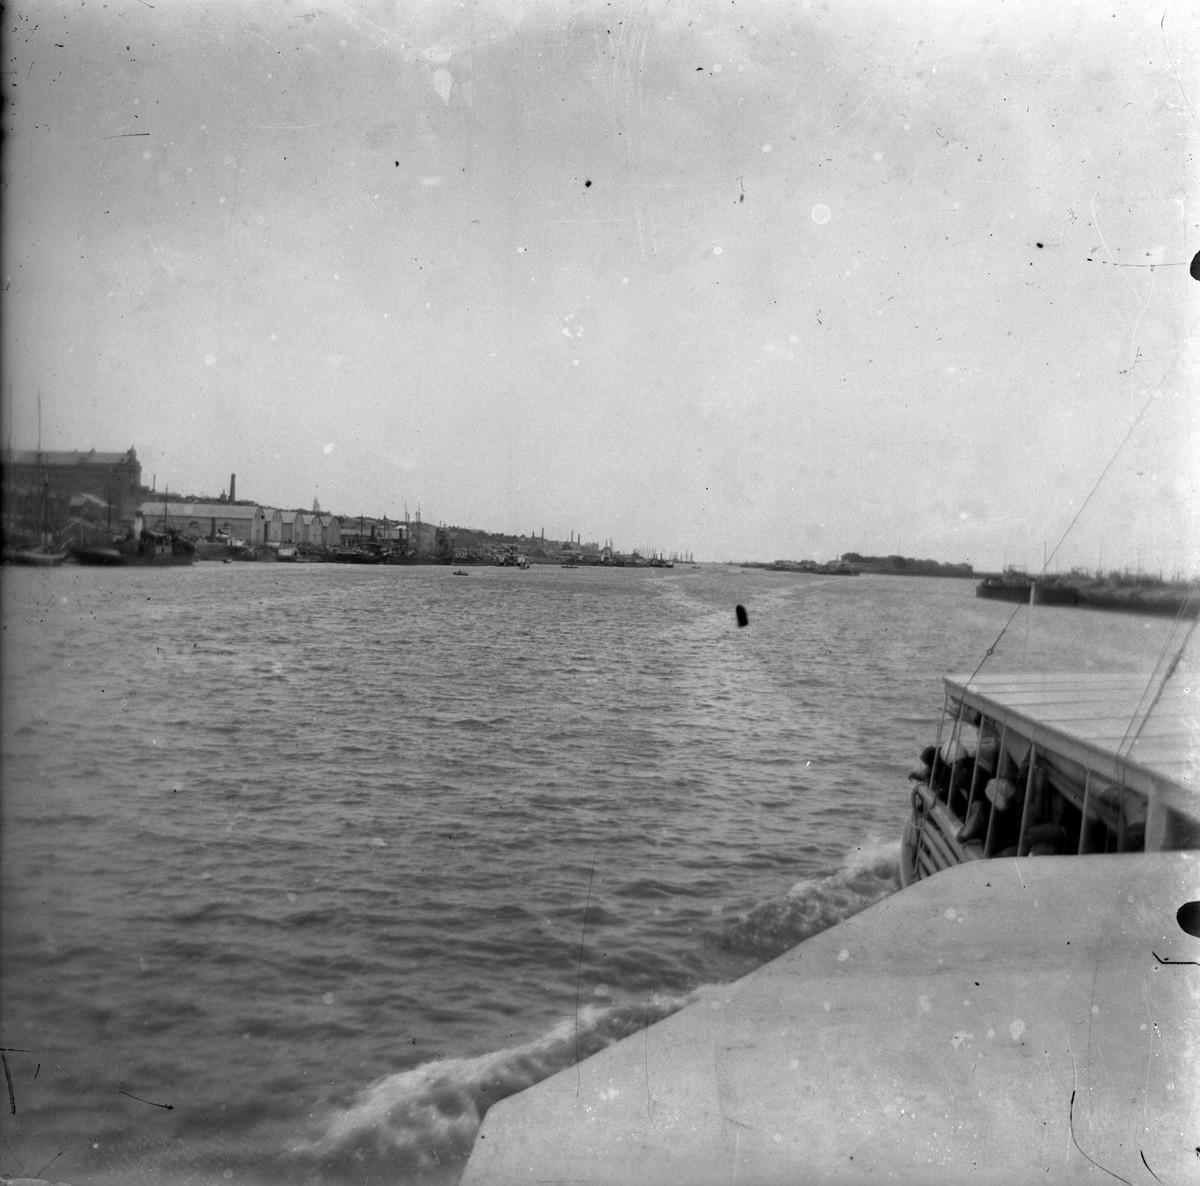 Река, у берегов корабли. Фото с парохода